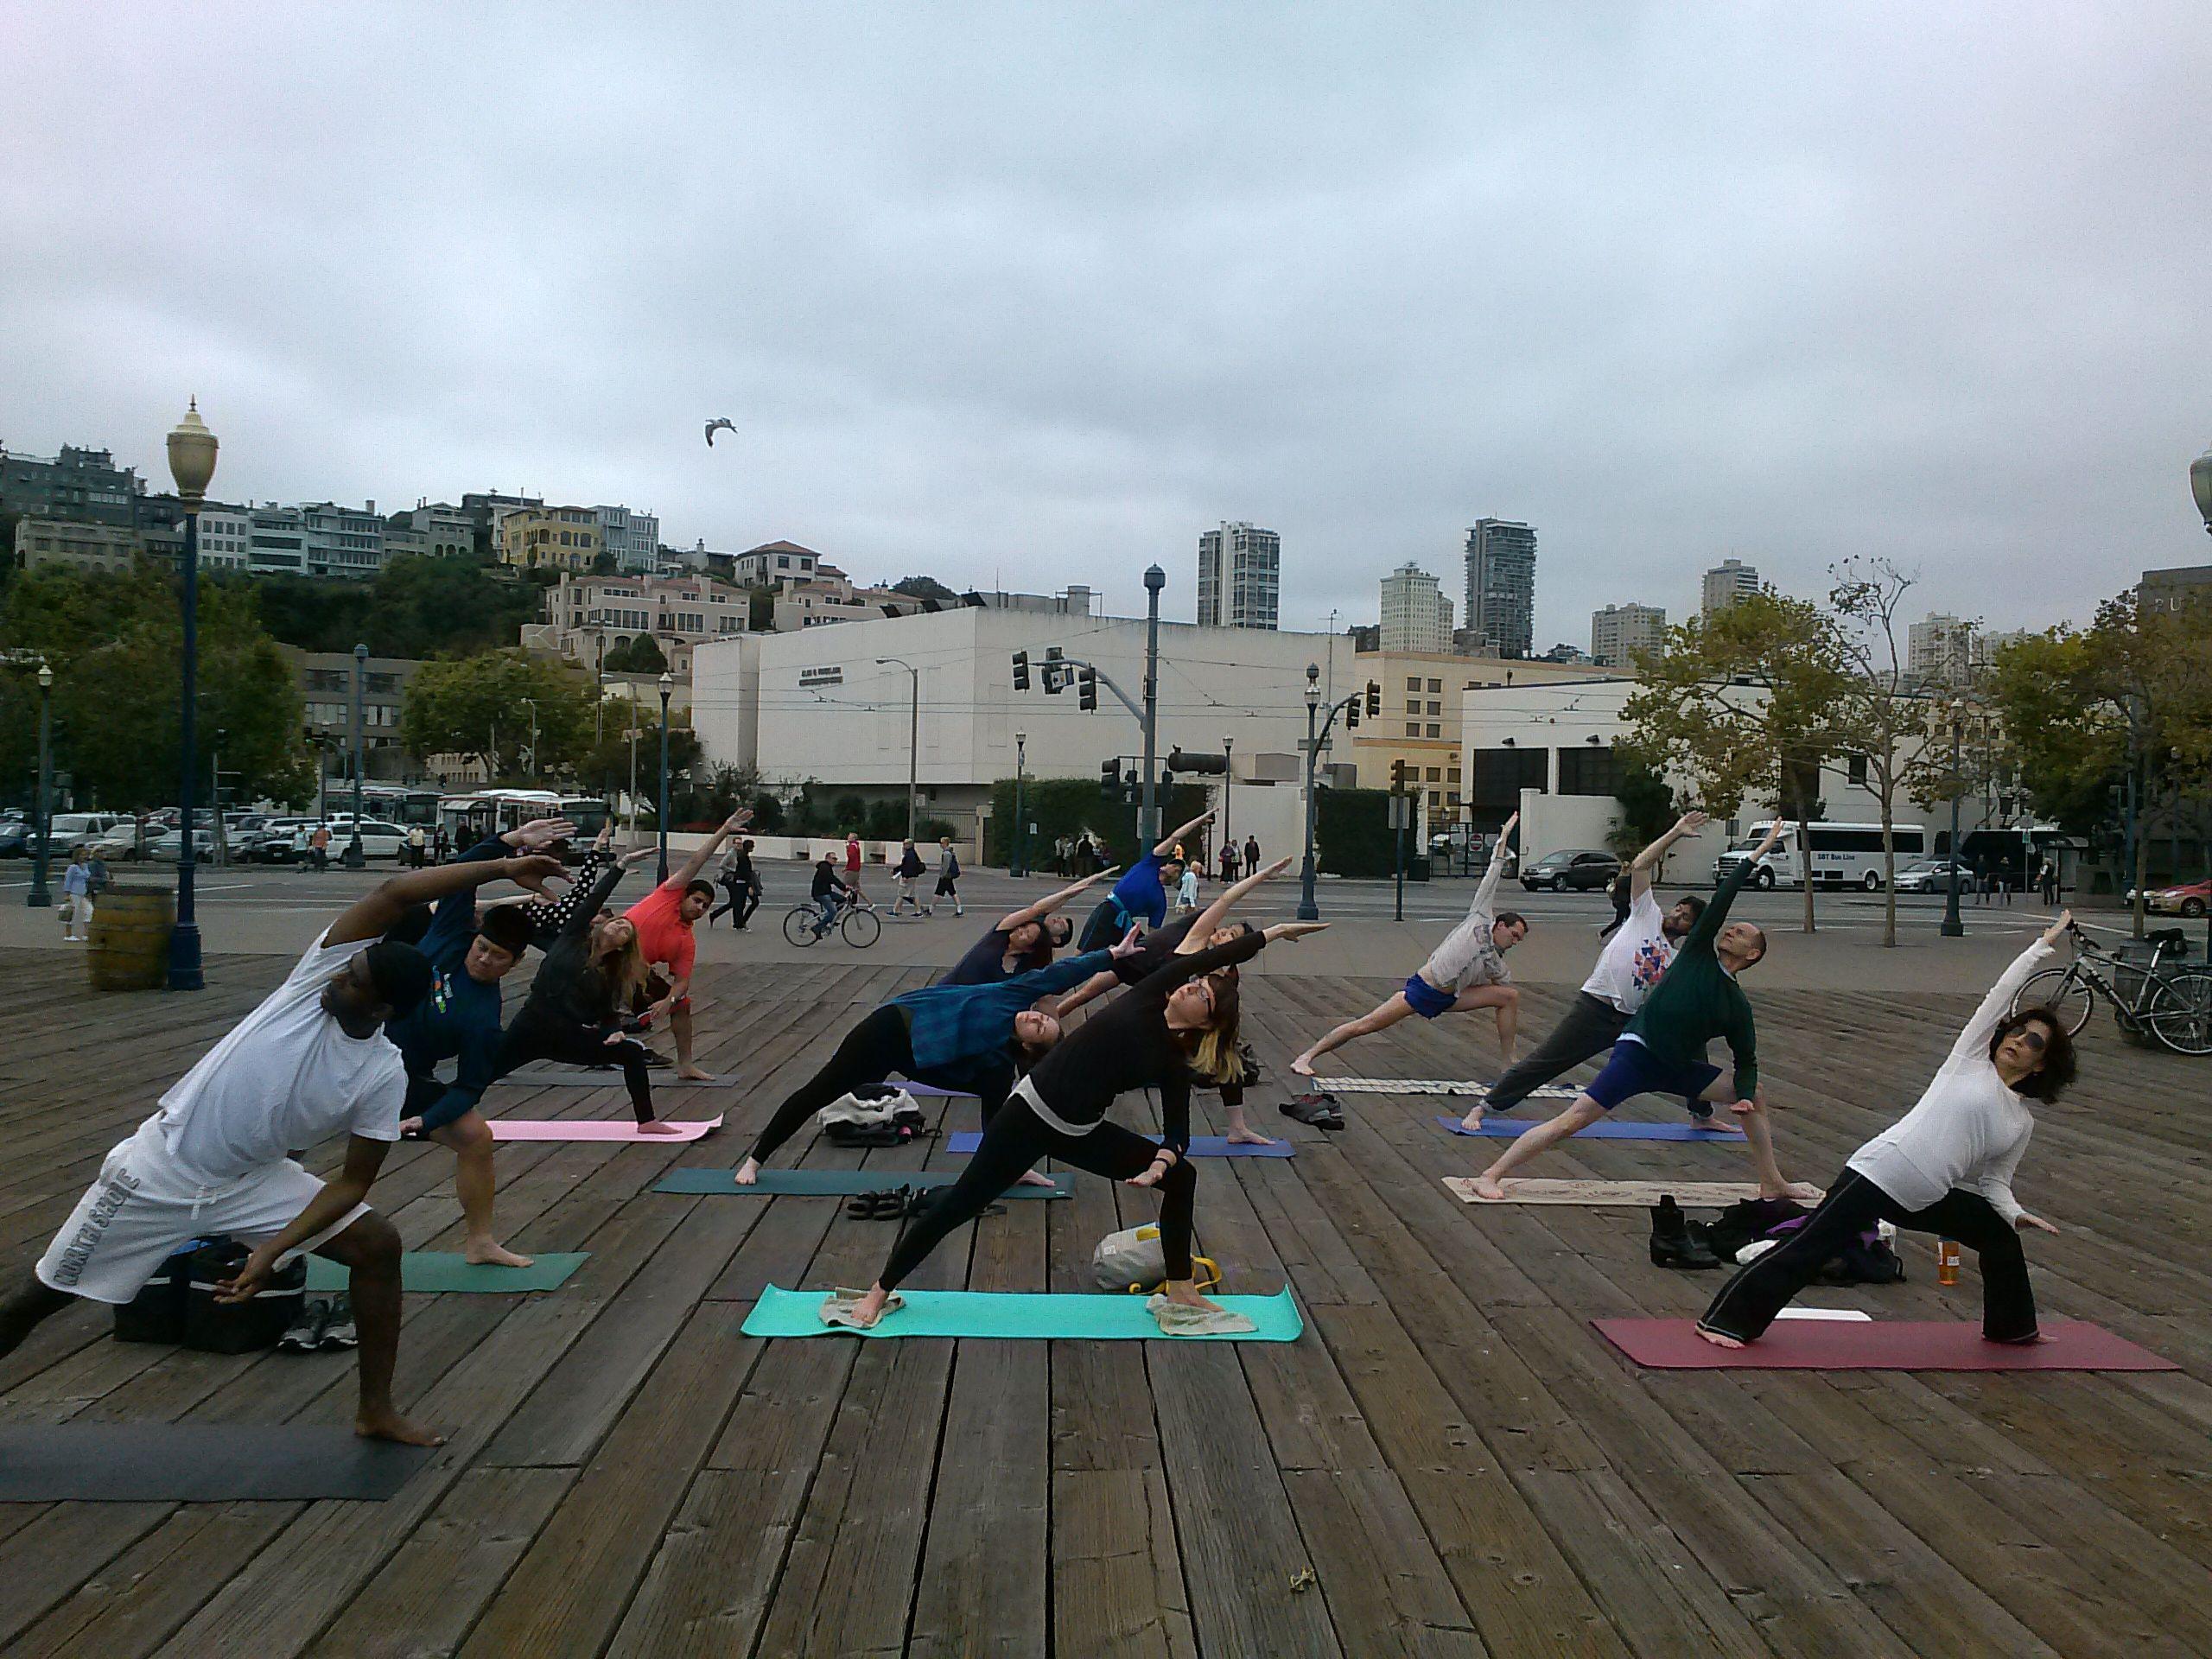 Http Ynottony1 Blogspot Com 2014 07 Free Yoga Classes Outdoors